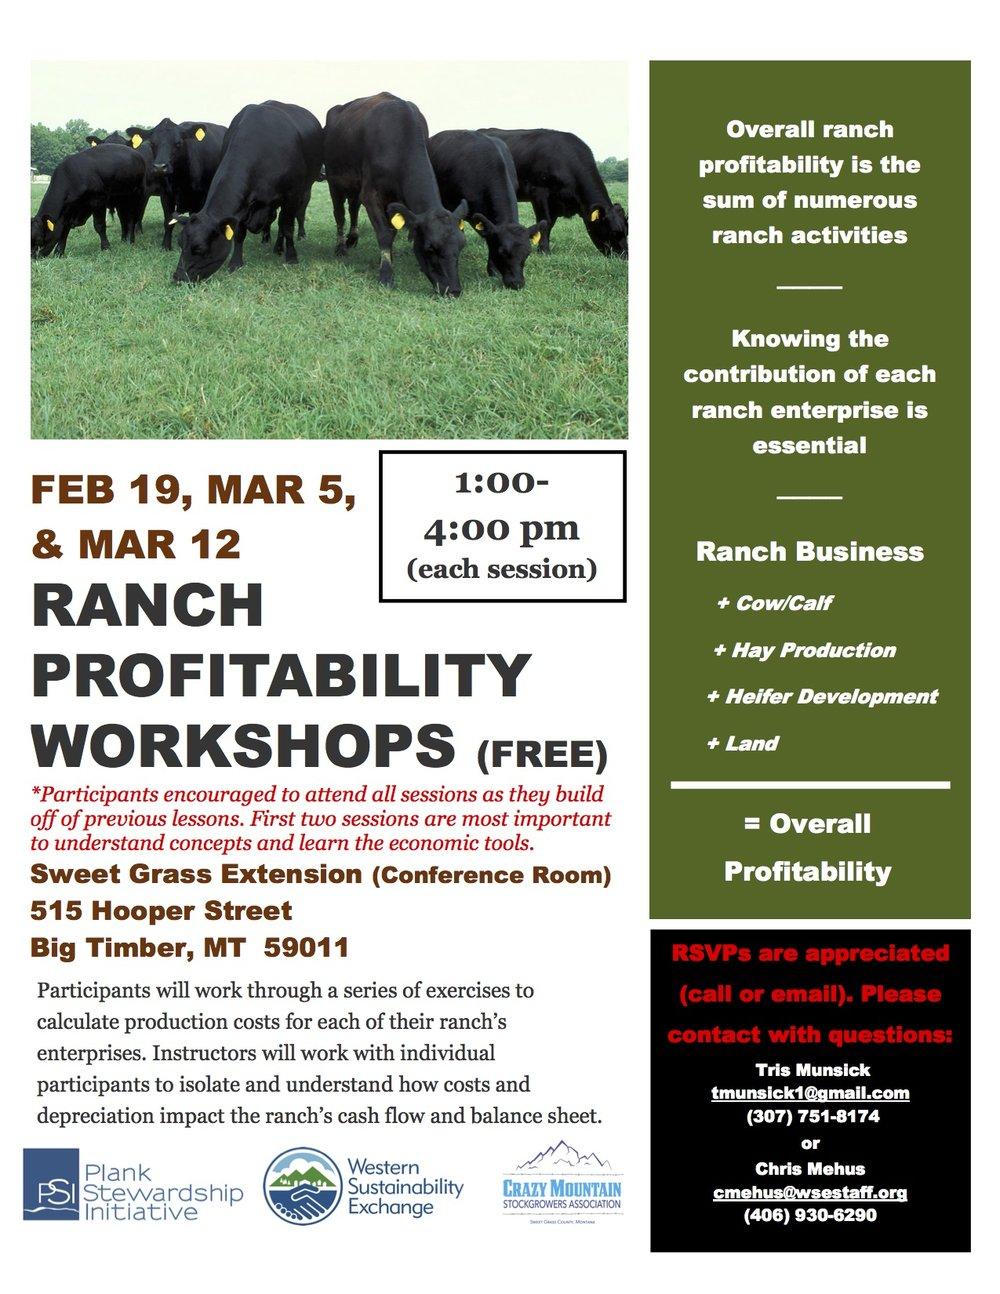 PLANK - Ranch Profitability Workshop Flyer.jpg